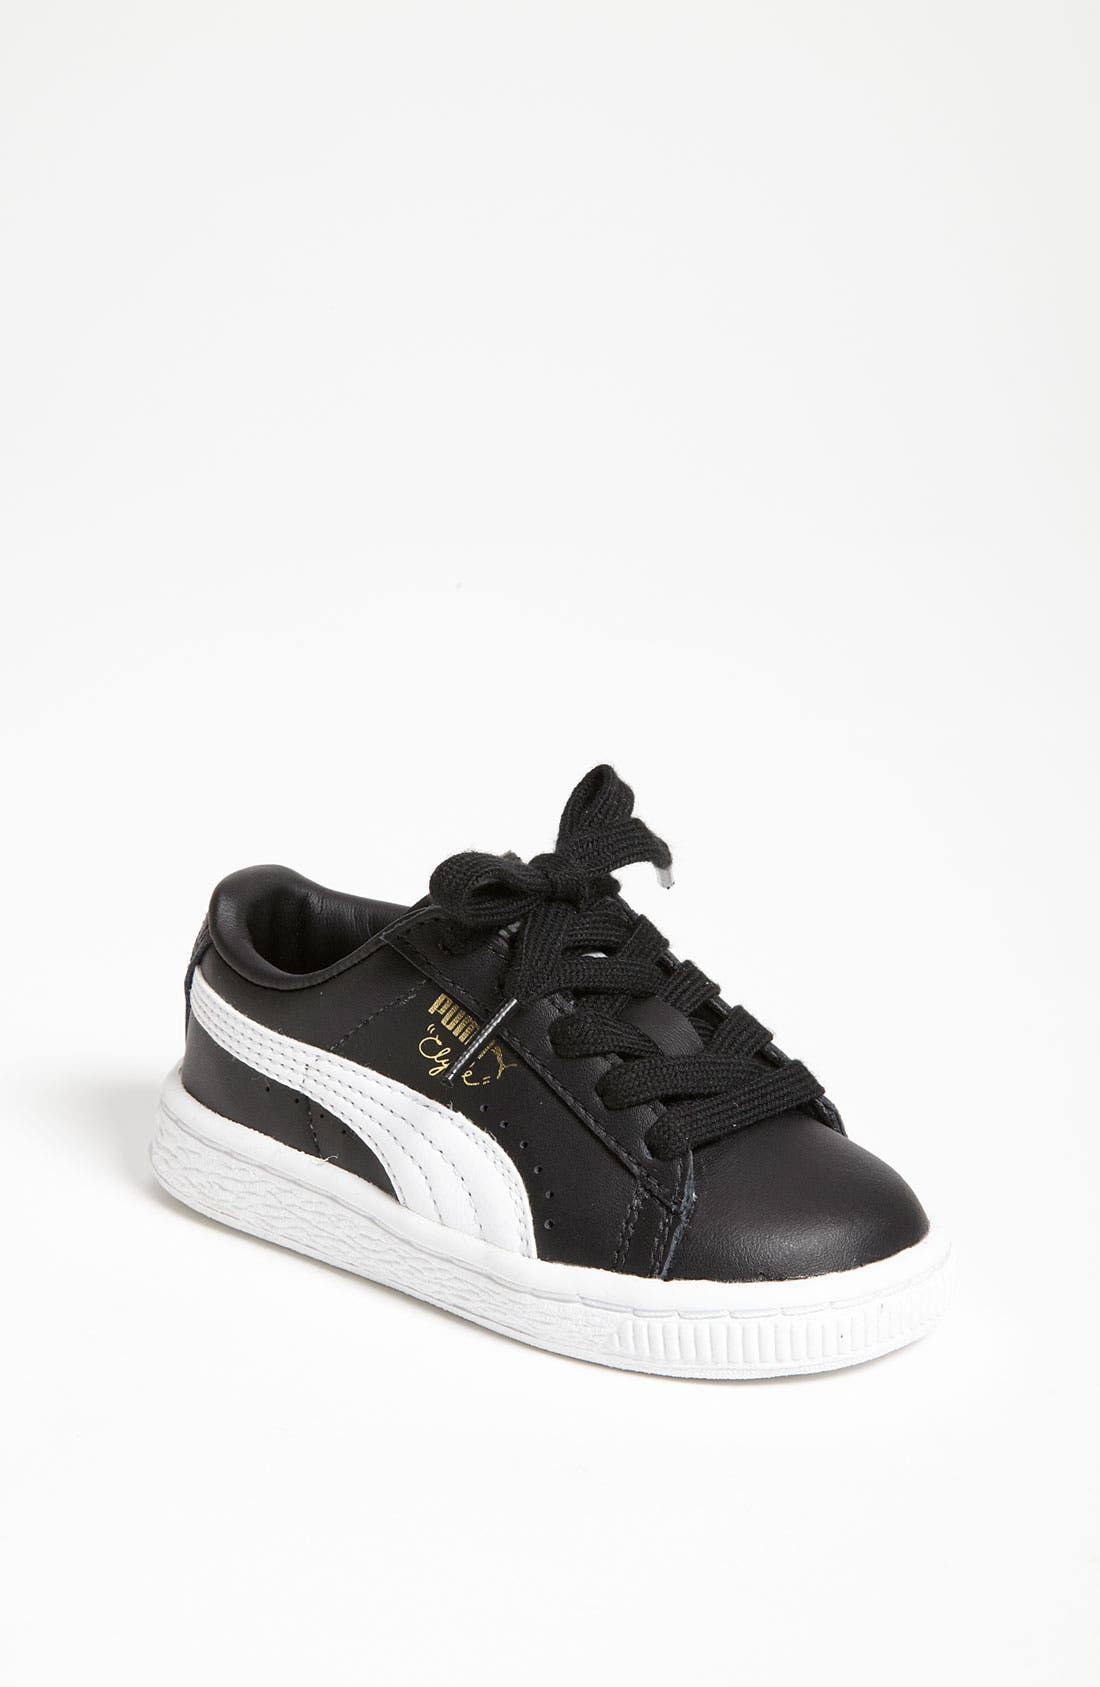 Alternate Image 1 Selected - PUMA 'Clyde' Sneaker (Baby, Walker & Toddler)